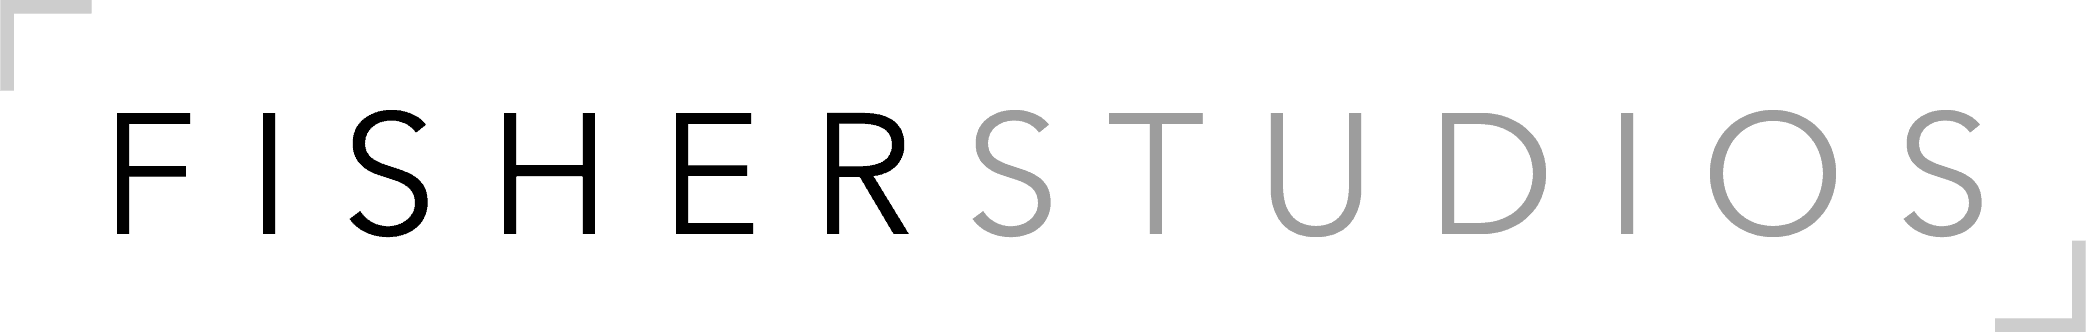 Fisher Studios - logo